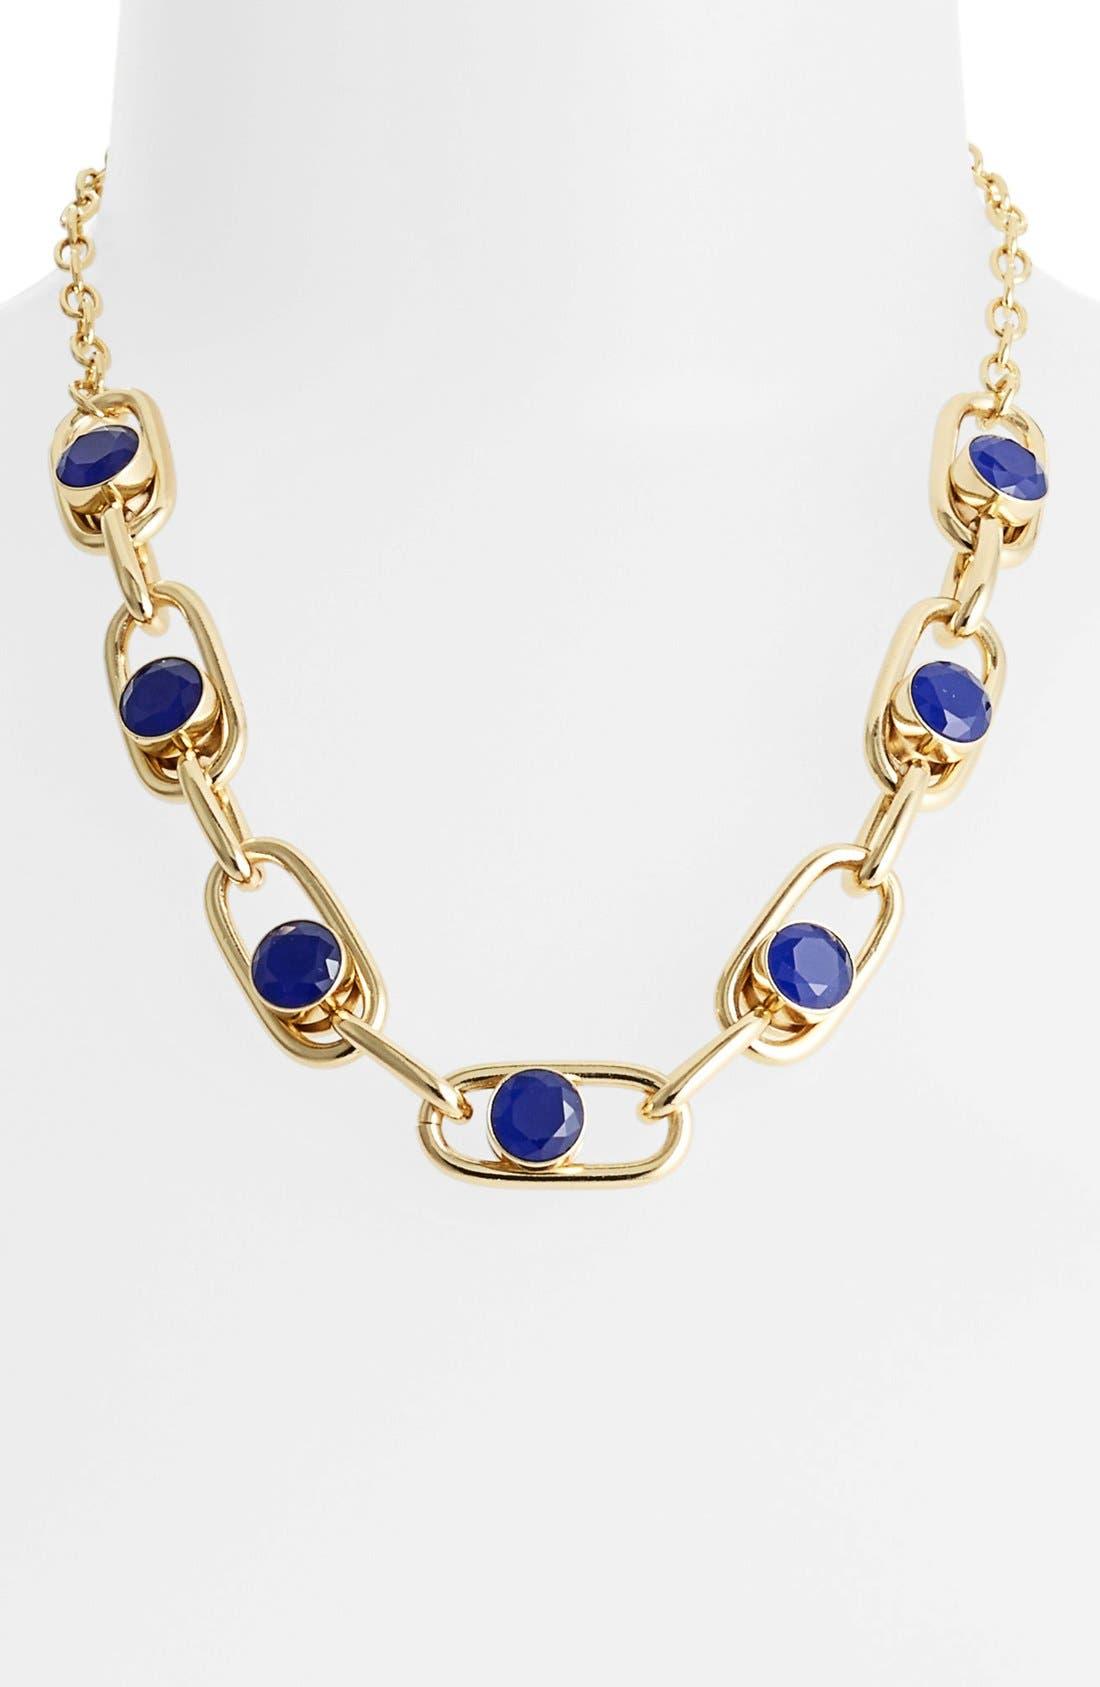 Main Image - kate spade new york 'get rolling' short link necklace